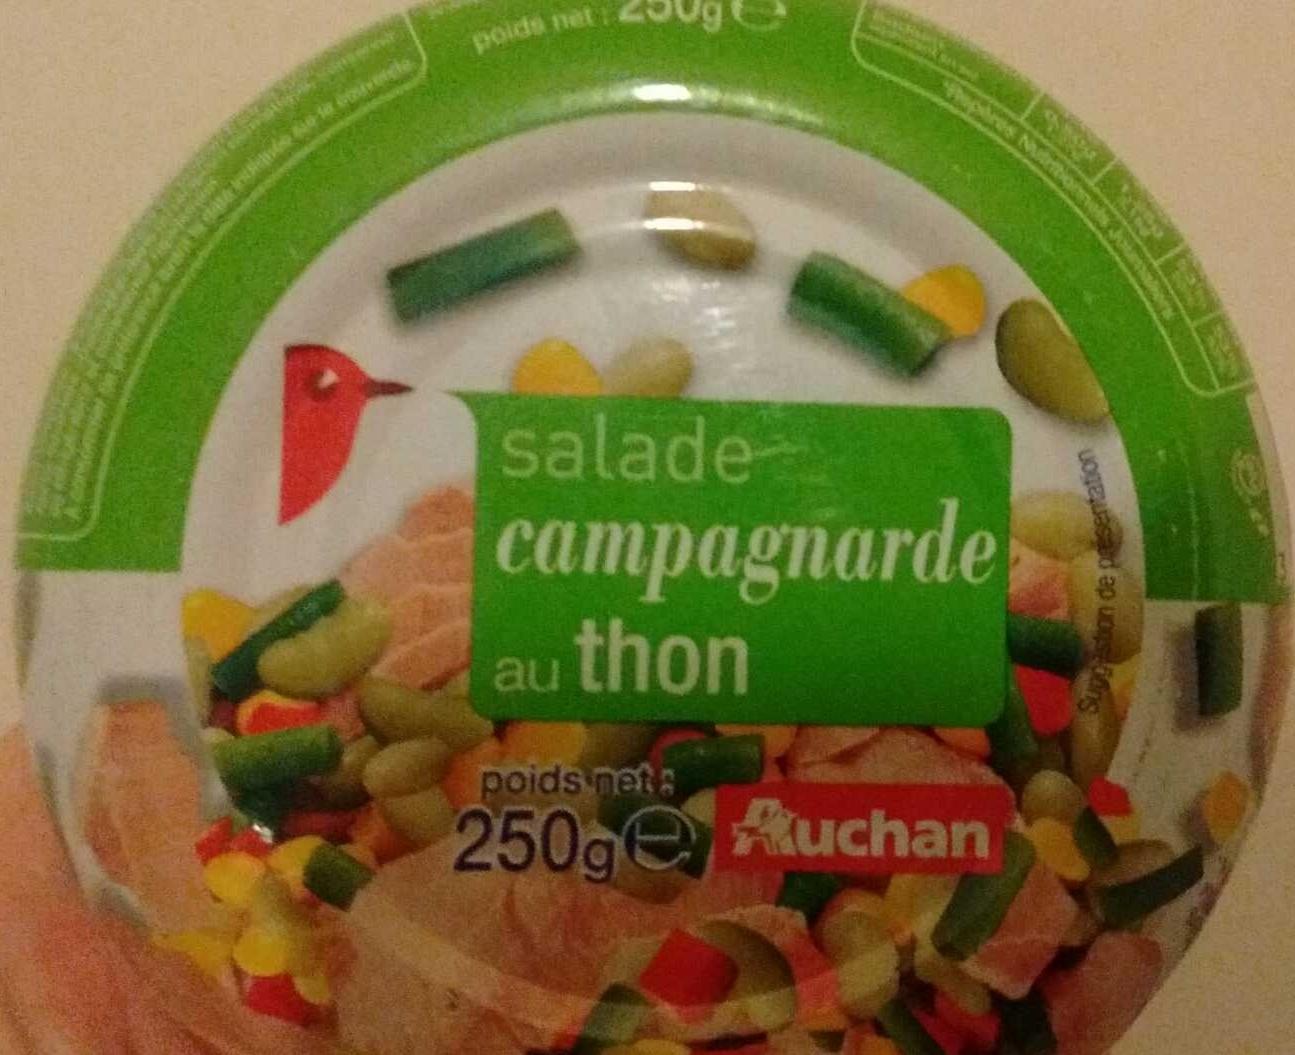 Salade campagnarde au thon - Produit